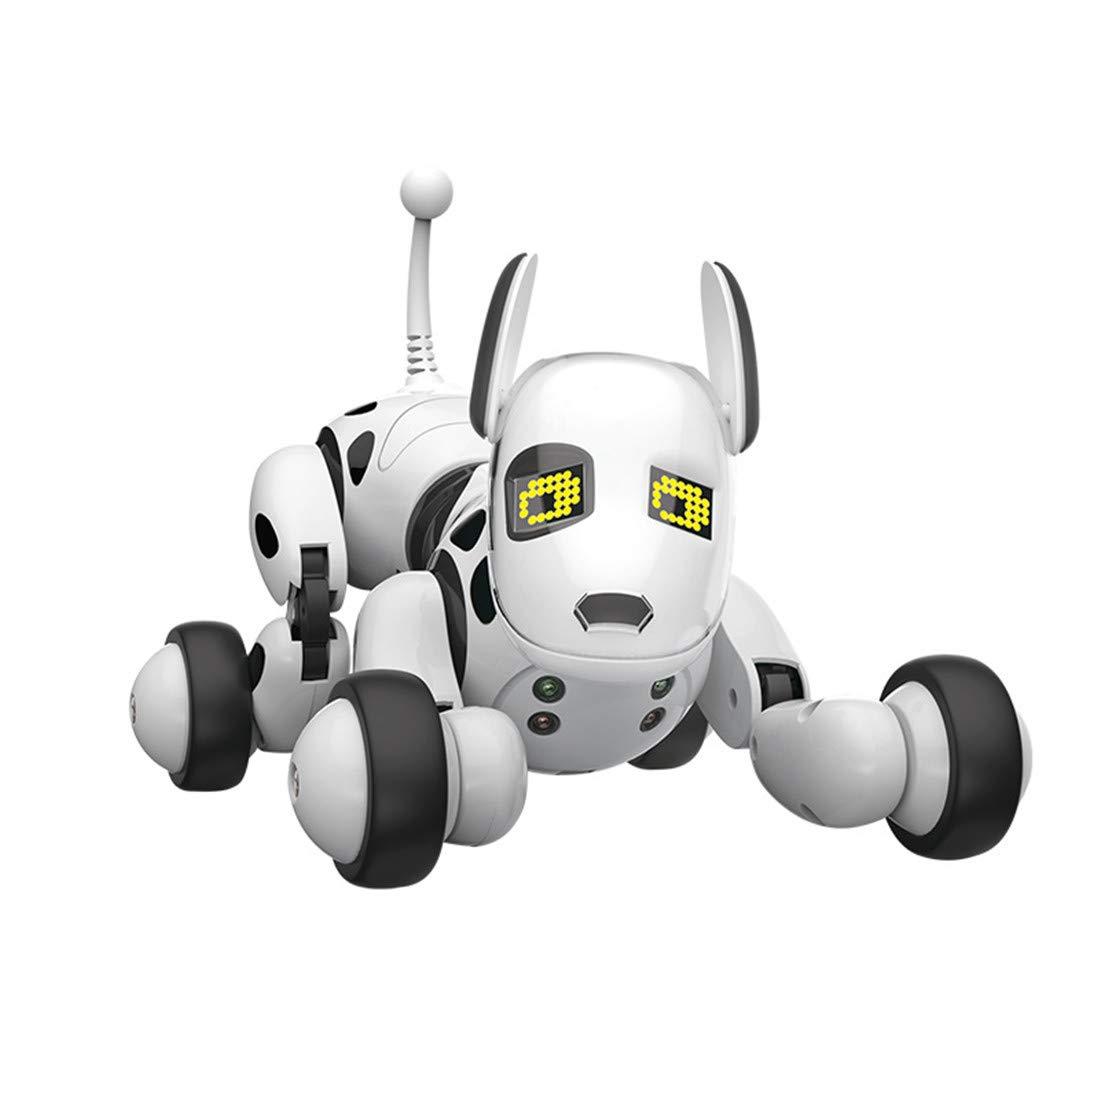 Rcスマートドッグリモコンインテリジェントロボット犬電子ペット教育玩具子供 B07NS7DYQ5 B